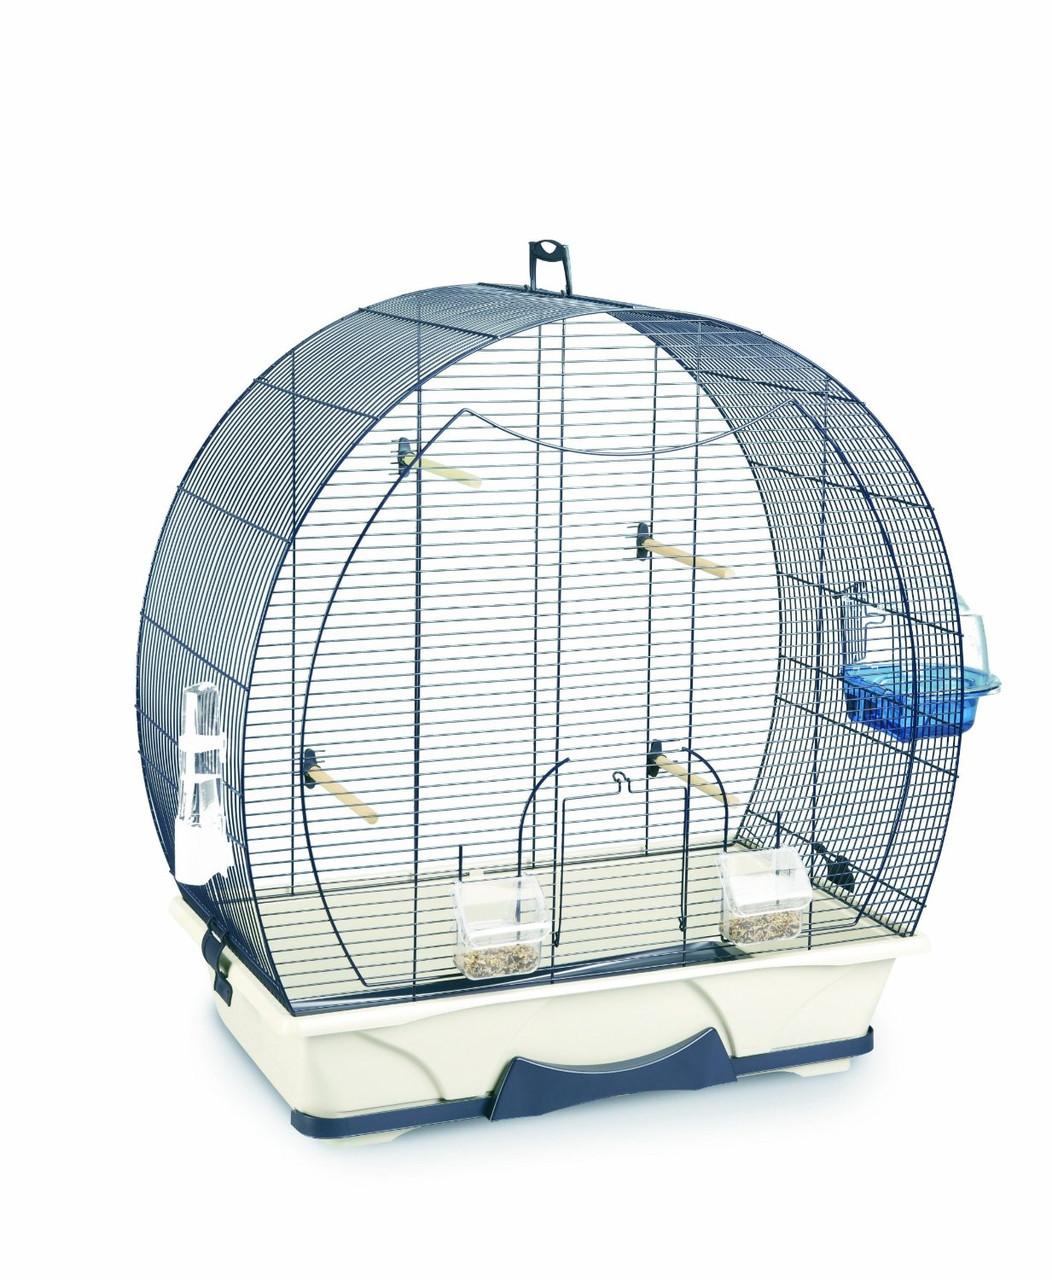 Клетка Savic Evelyne 50 (Эвелин) для птиц, 70х36х73 см - Интернет-зоомагазин Royal Zoo в Харькове